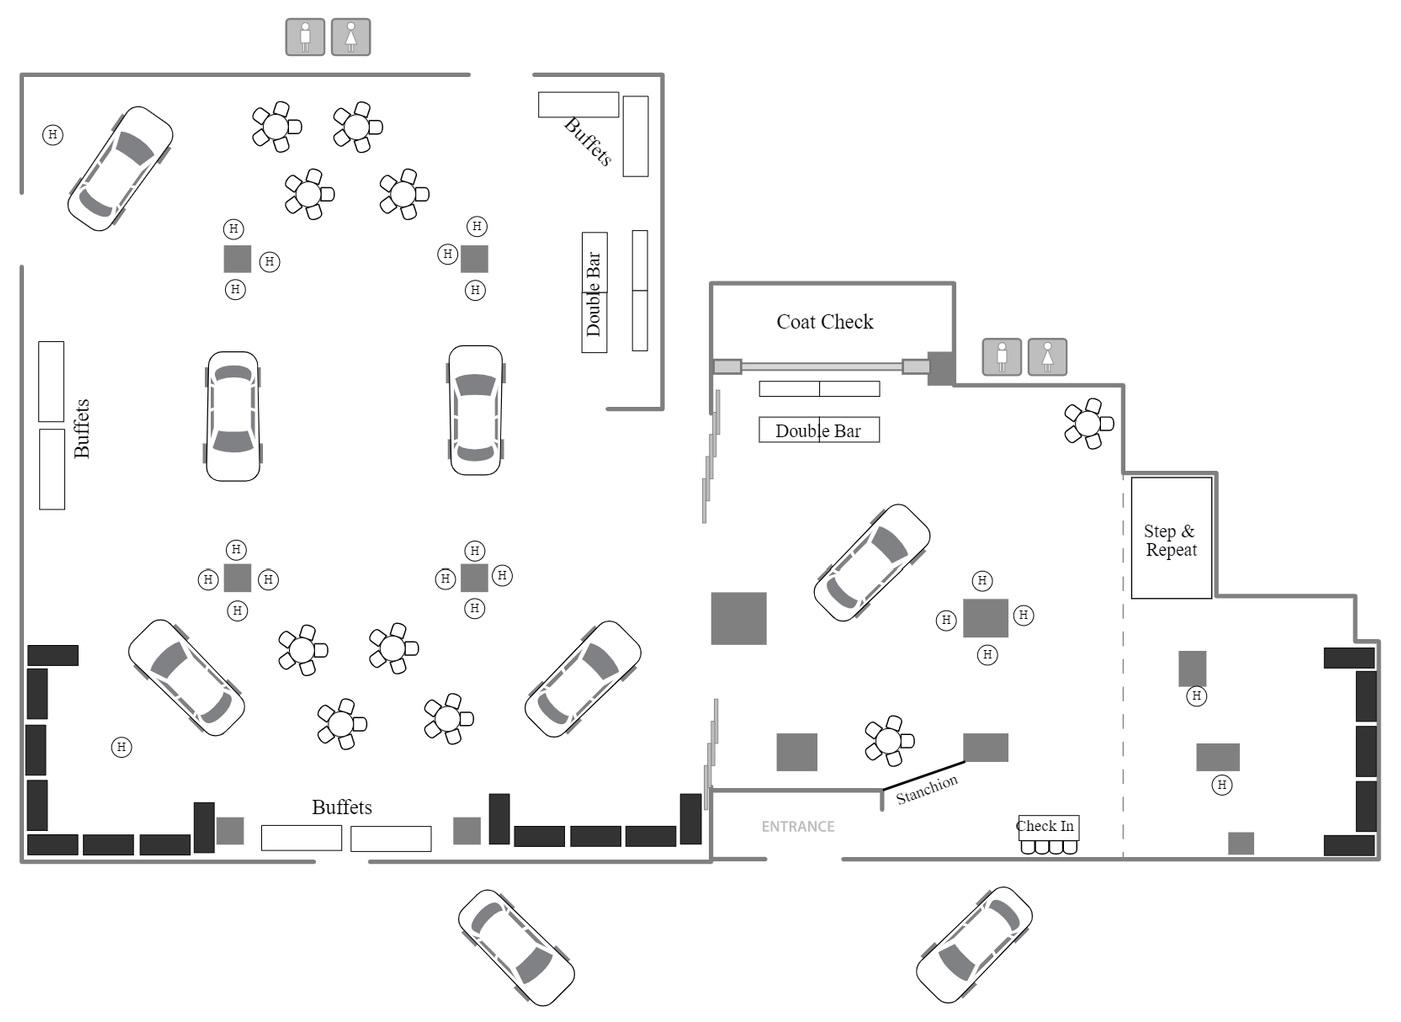 Auto Show Reception Floor Plan